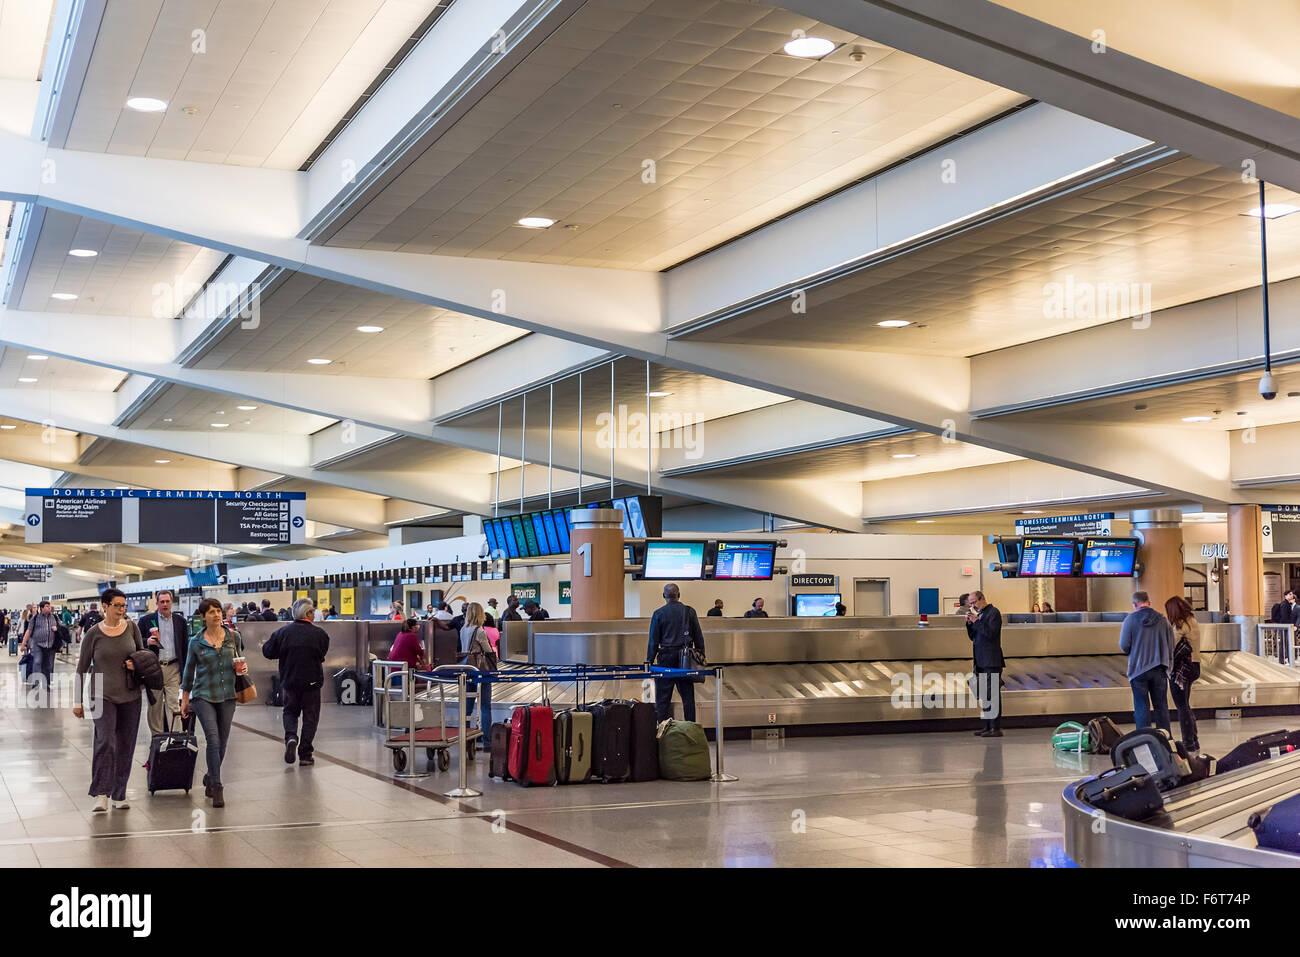 Baggage claim in the Atlanta airport, Georgia, USA - Stock Image